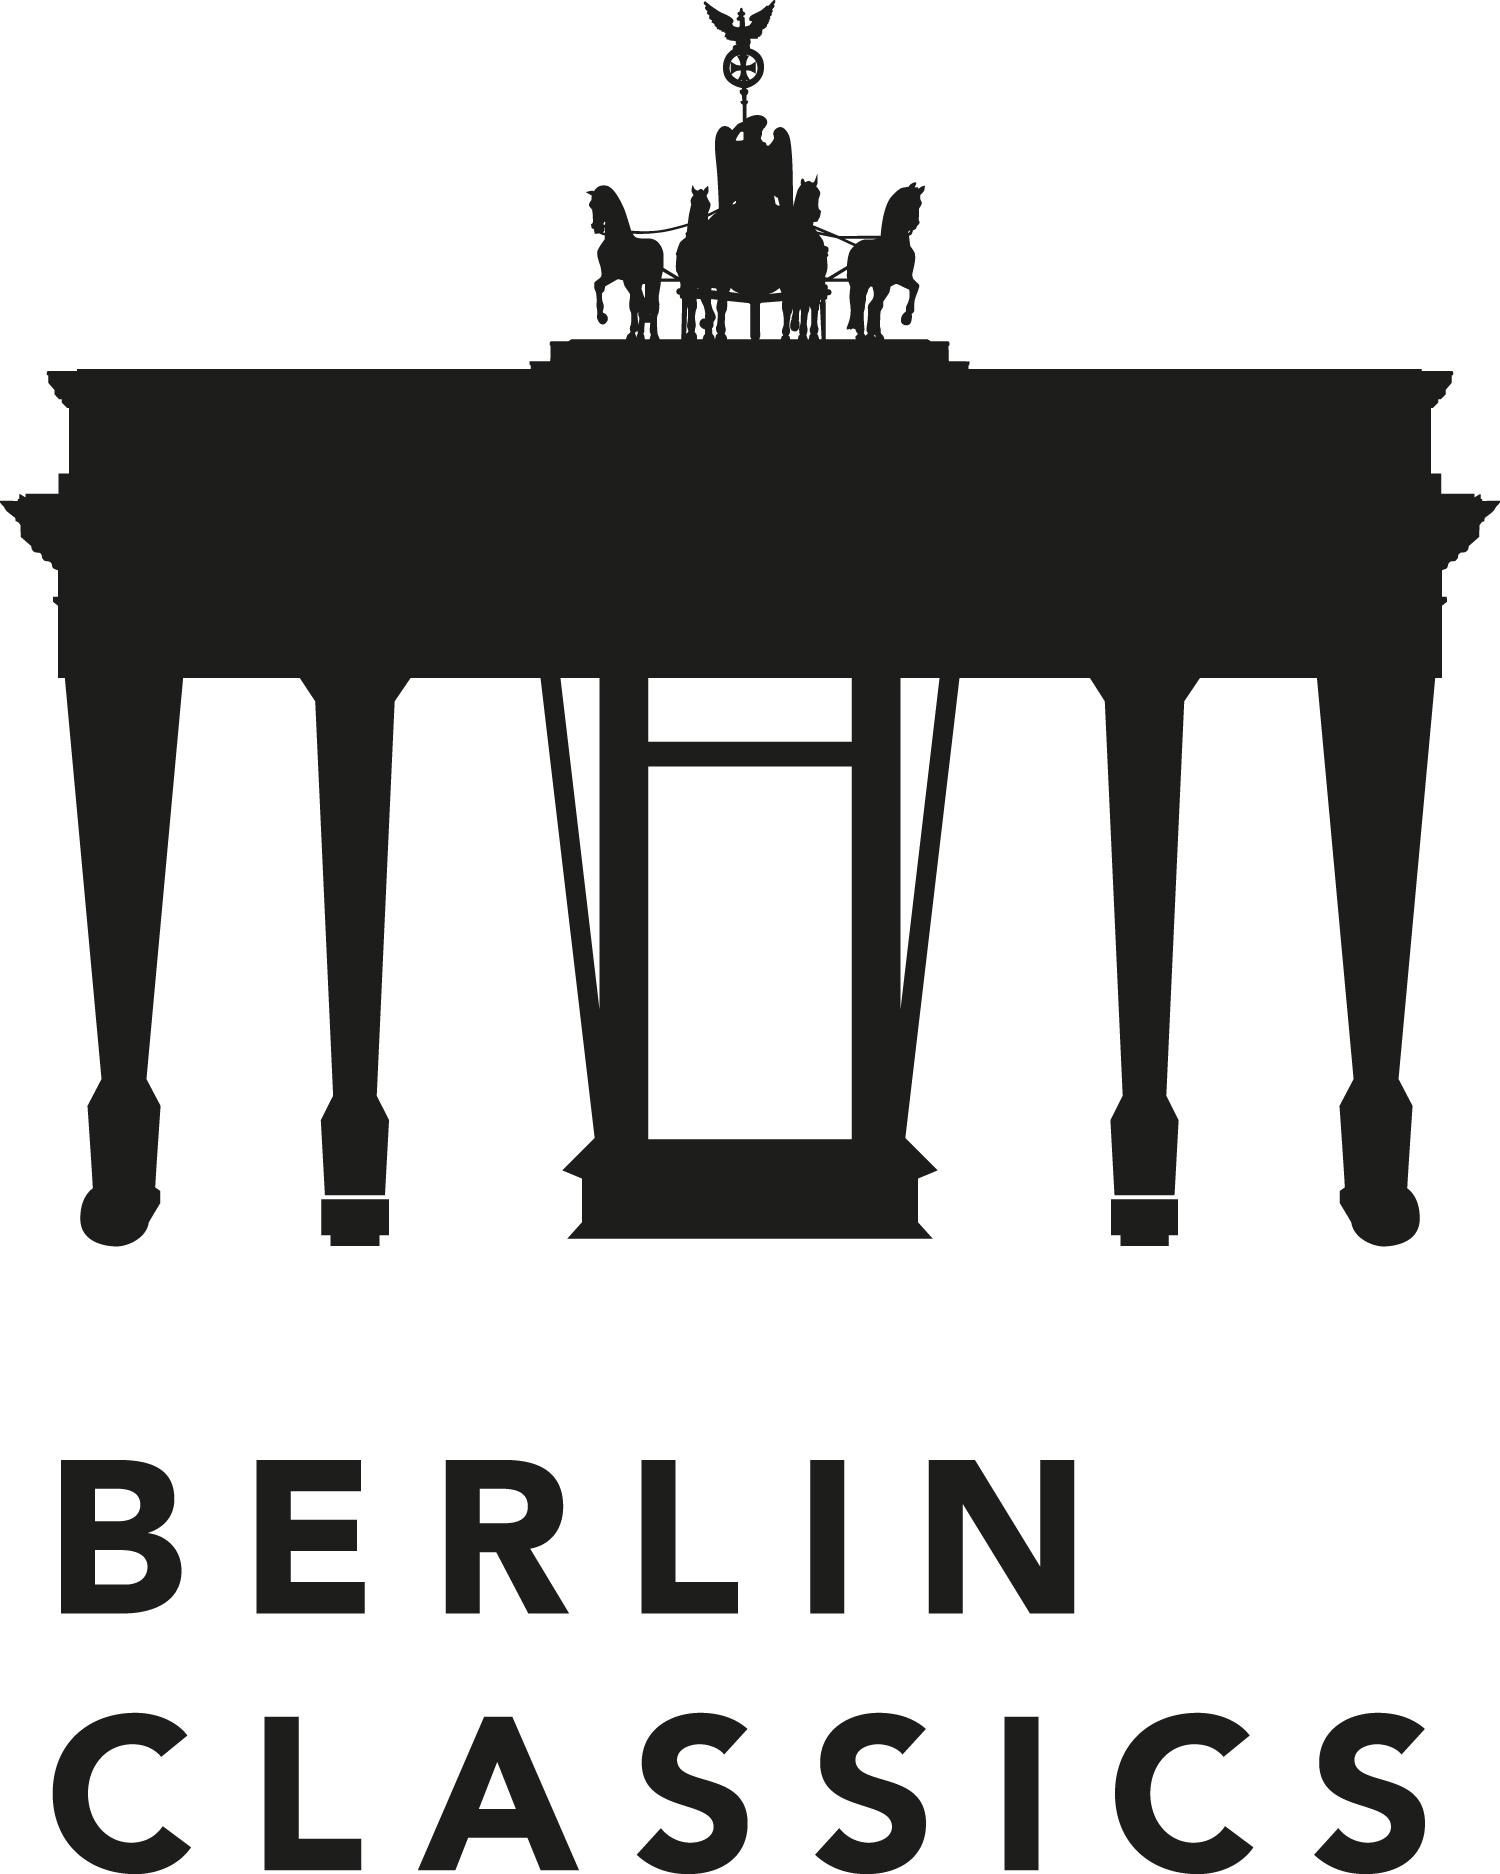 Berlin_Klassik_Logo_Black300dpi-1